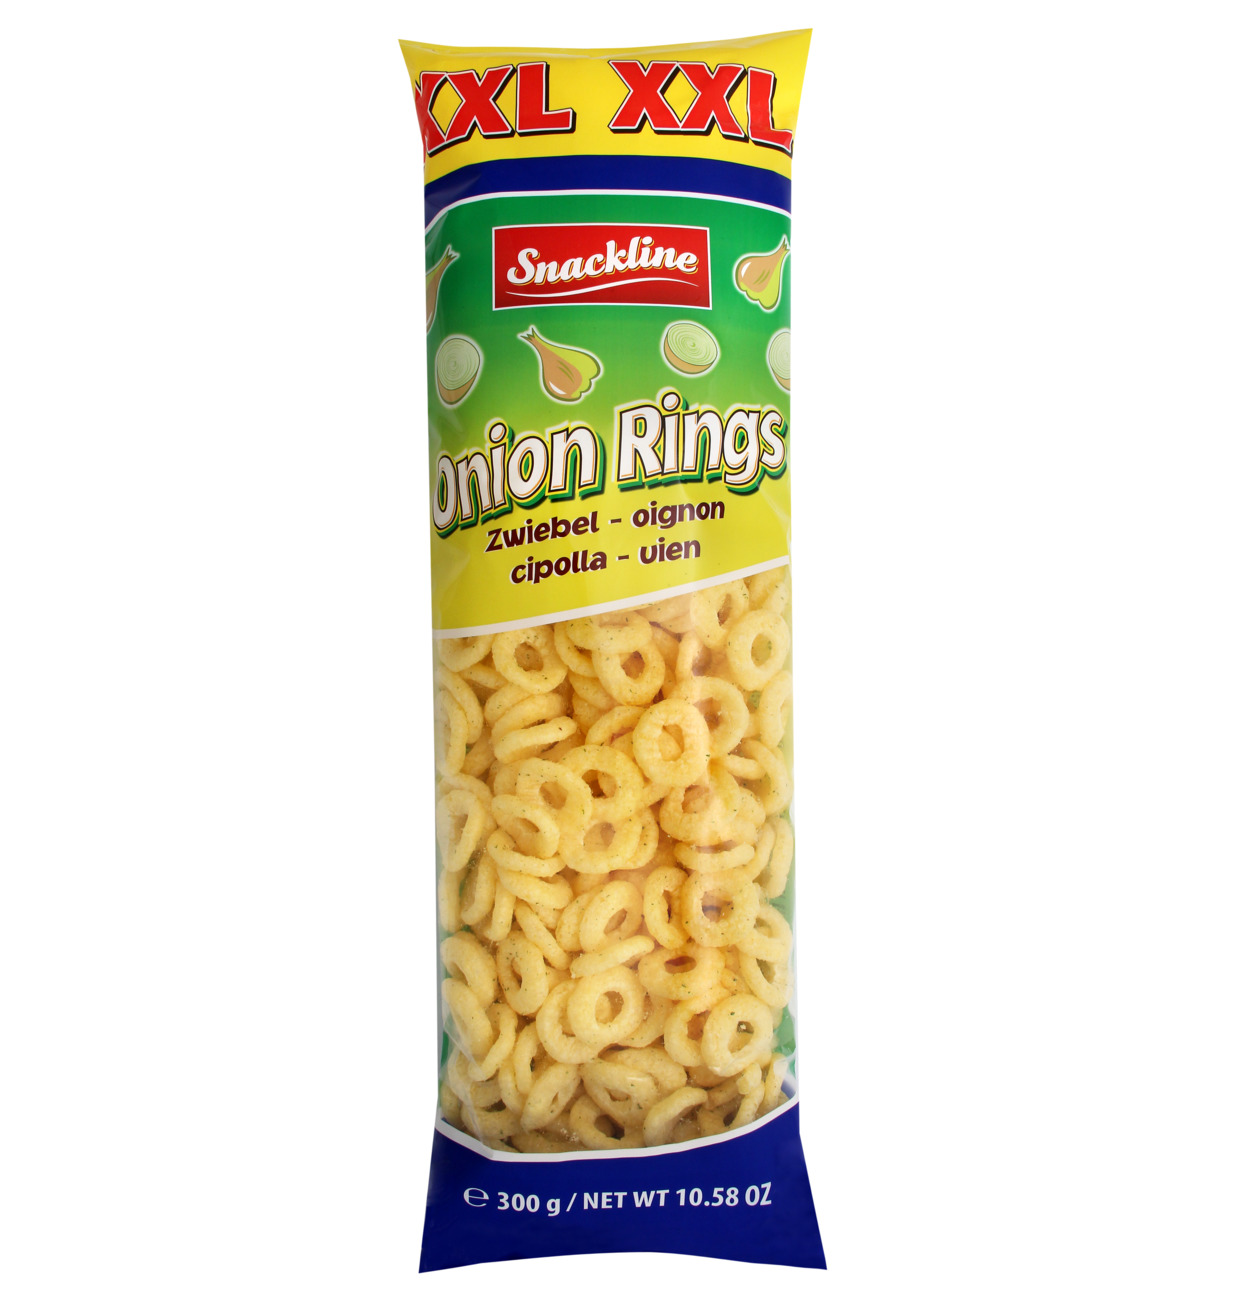 Snackline Onion Rings XXL Bag 300g